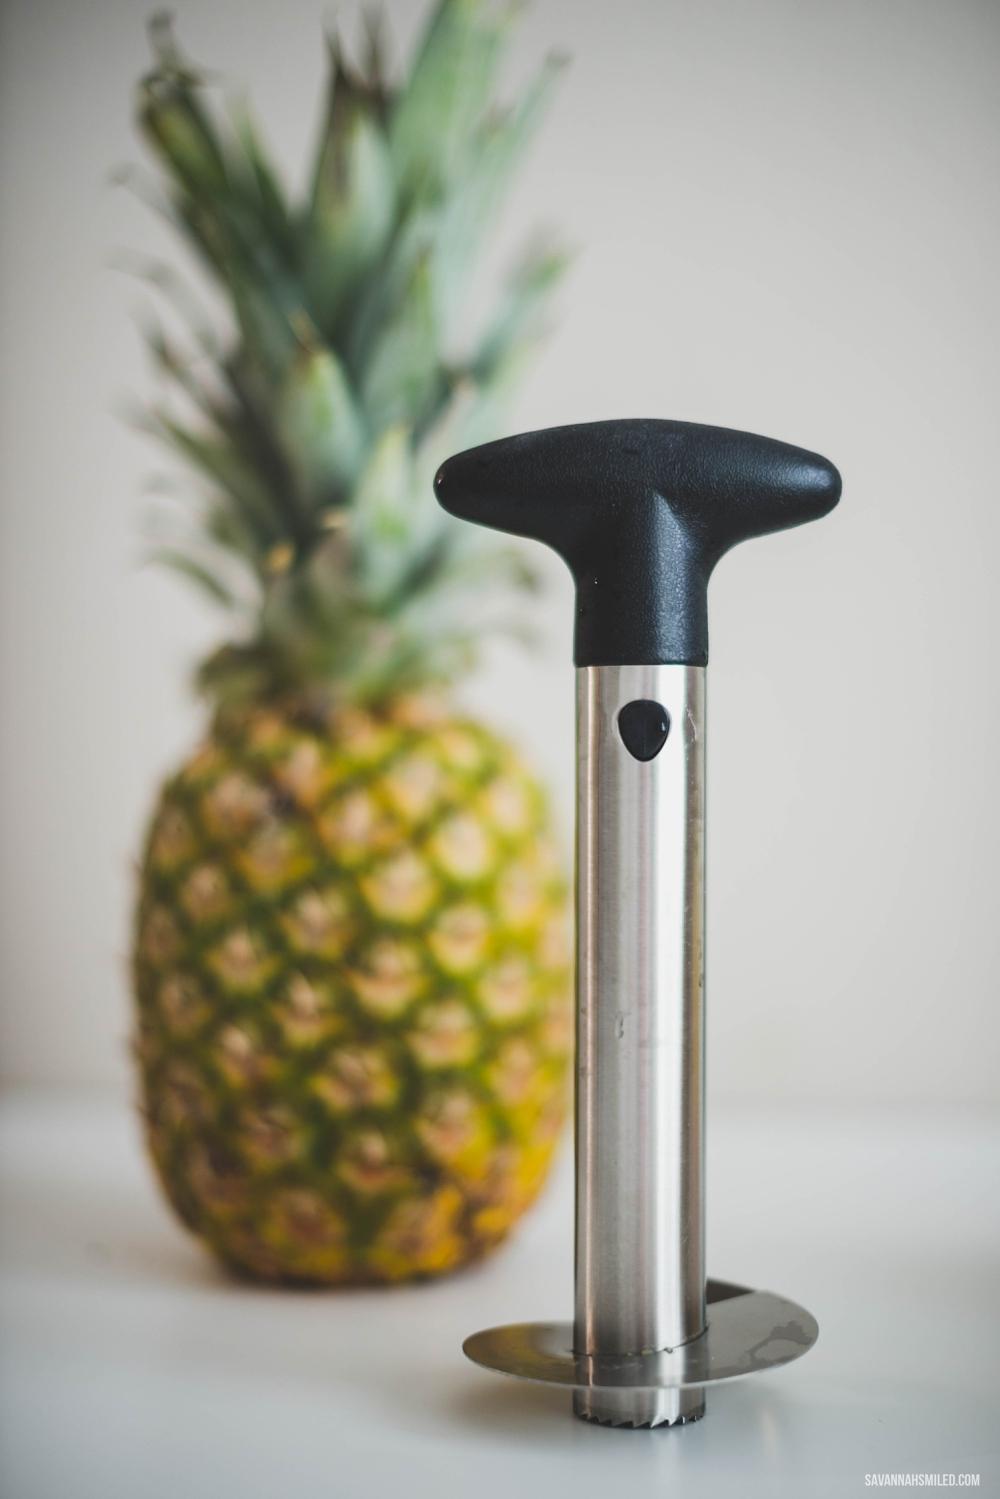 pinapple-slicer-amazon-6.jpg